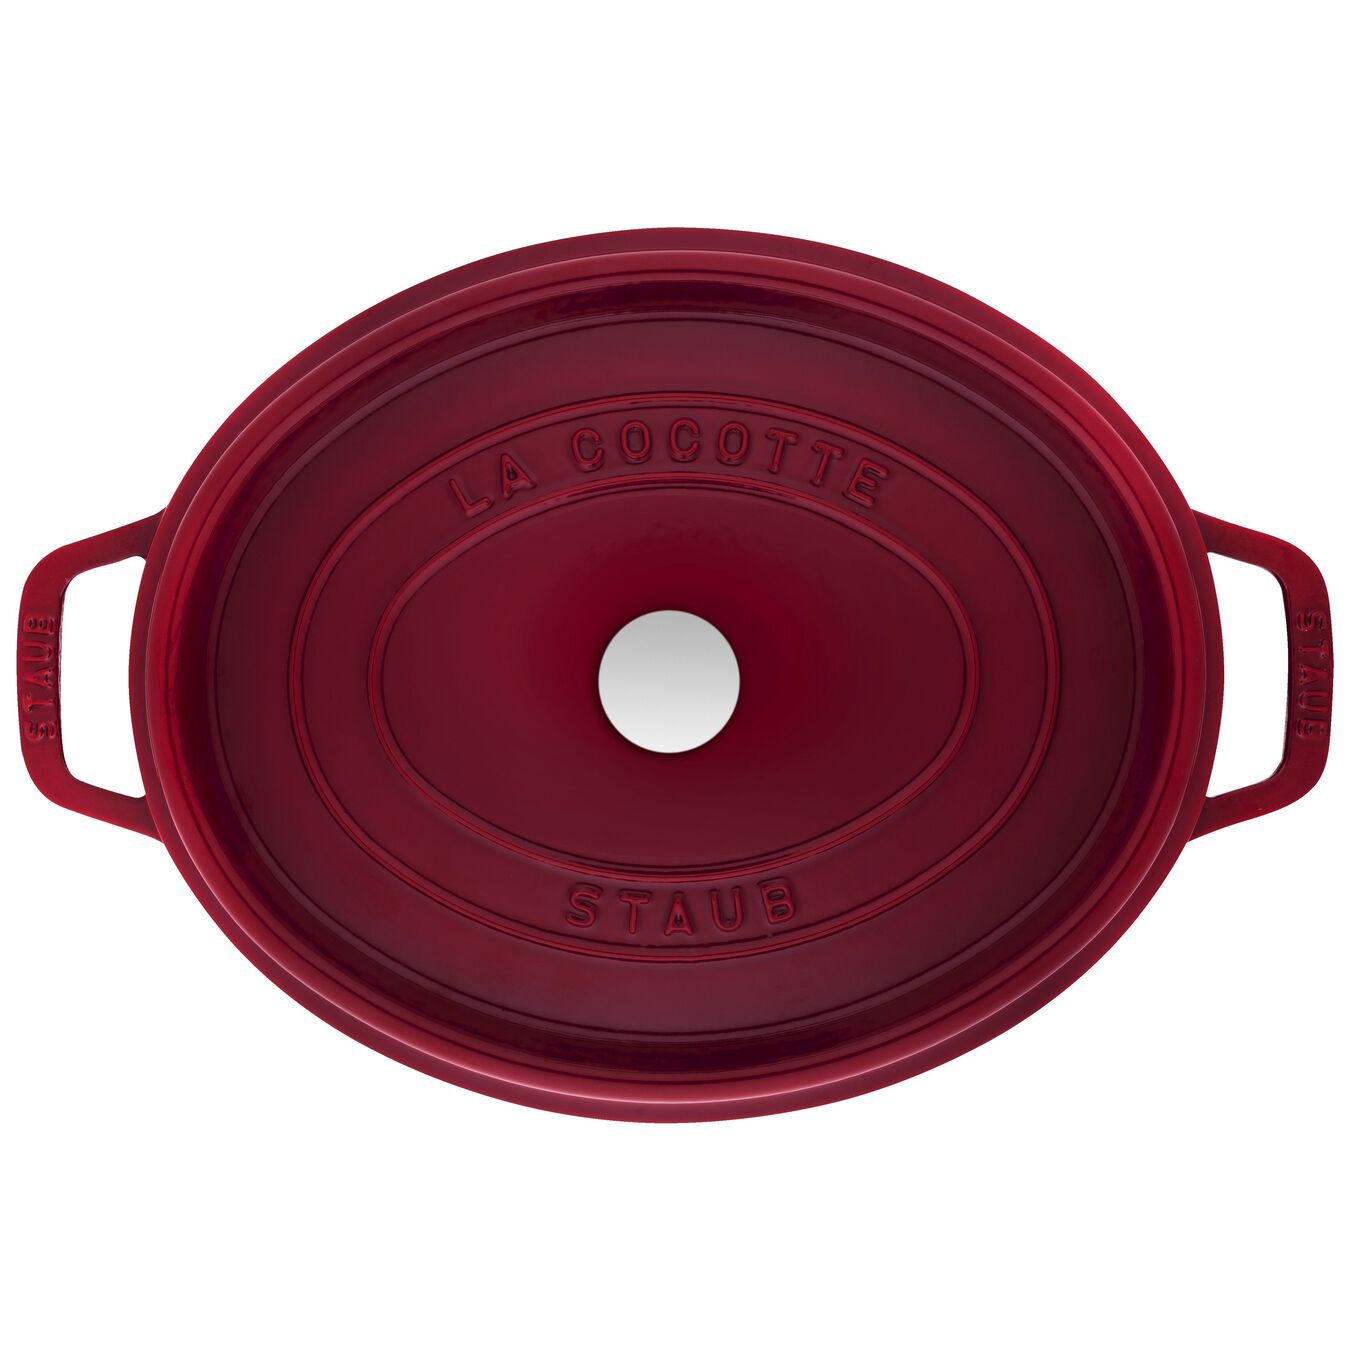 5.5 l Cast iron oval Cocotte, Bordeaux - Visual Imperfections,,large 3